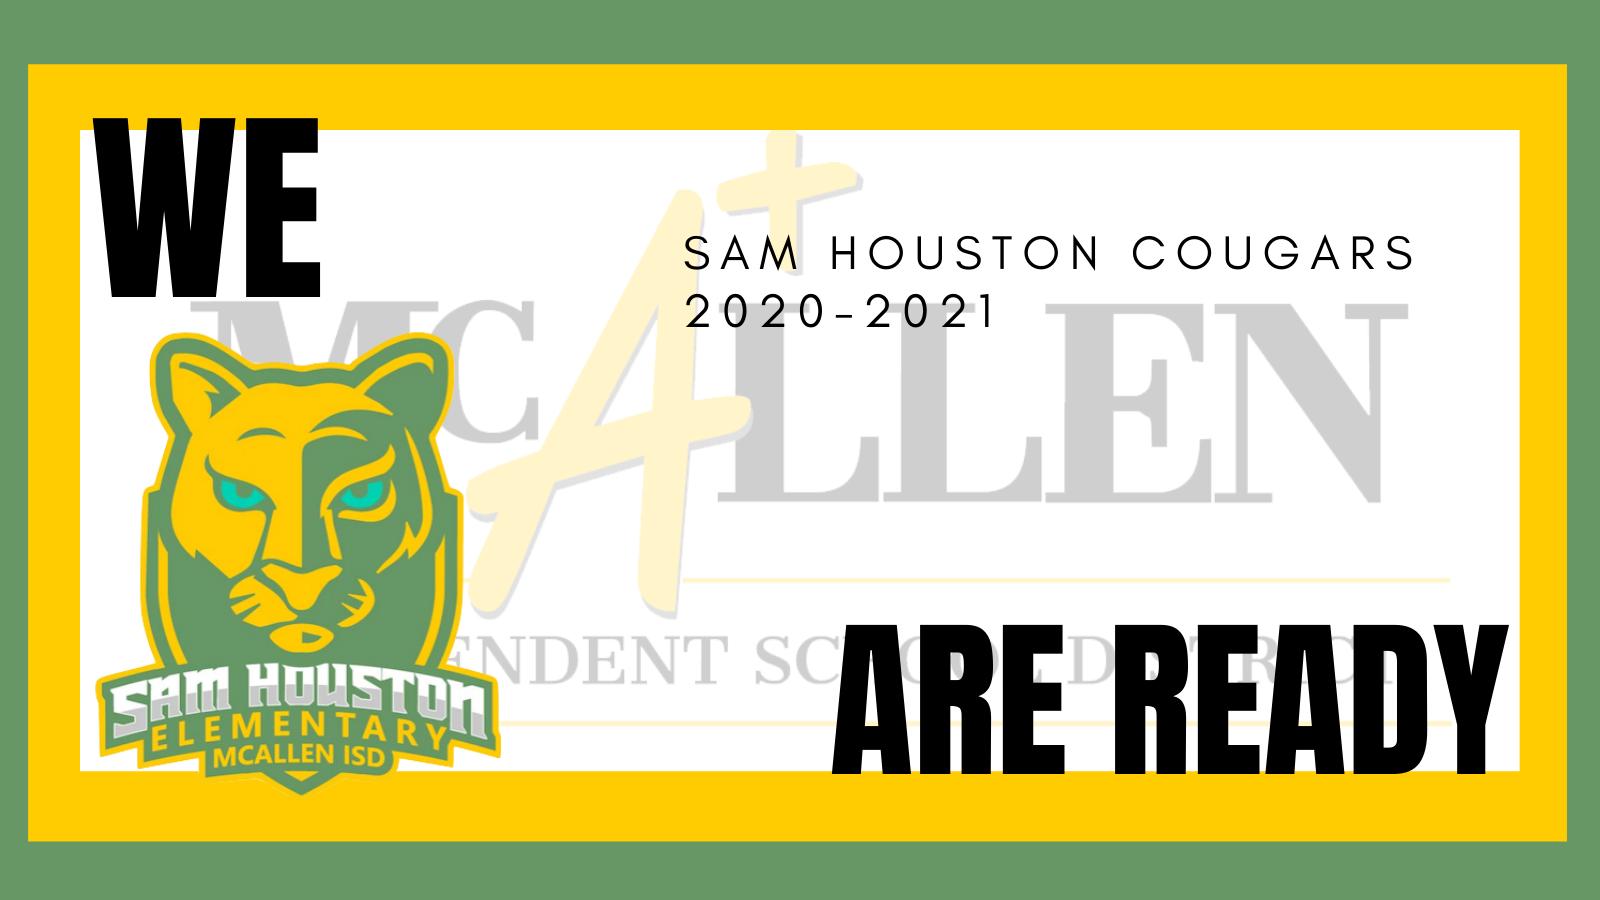 Sam Houston Cougars: 2020-2021